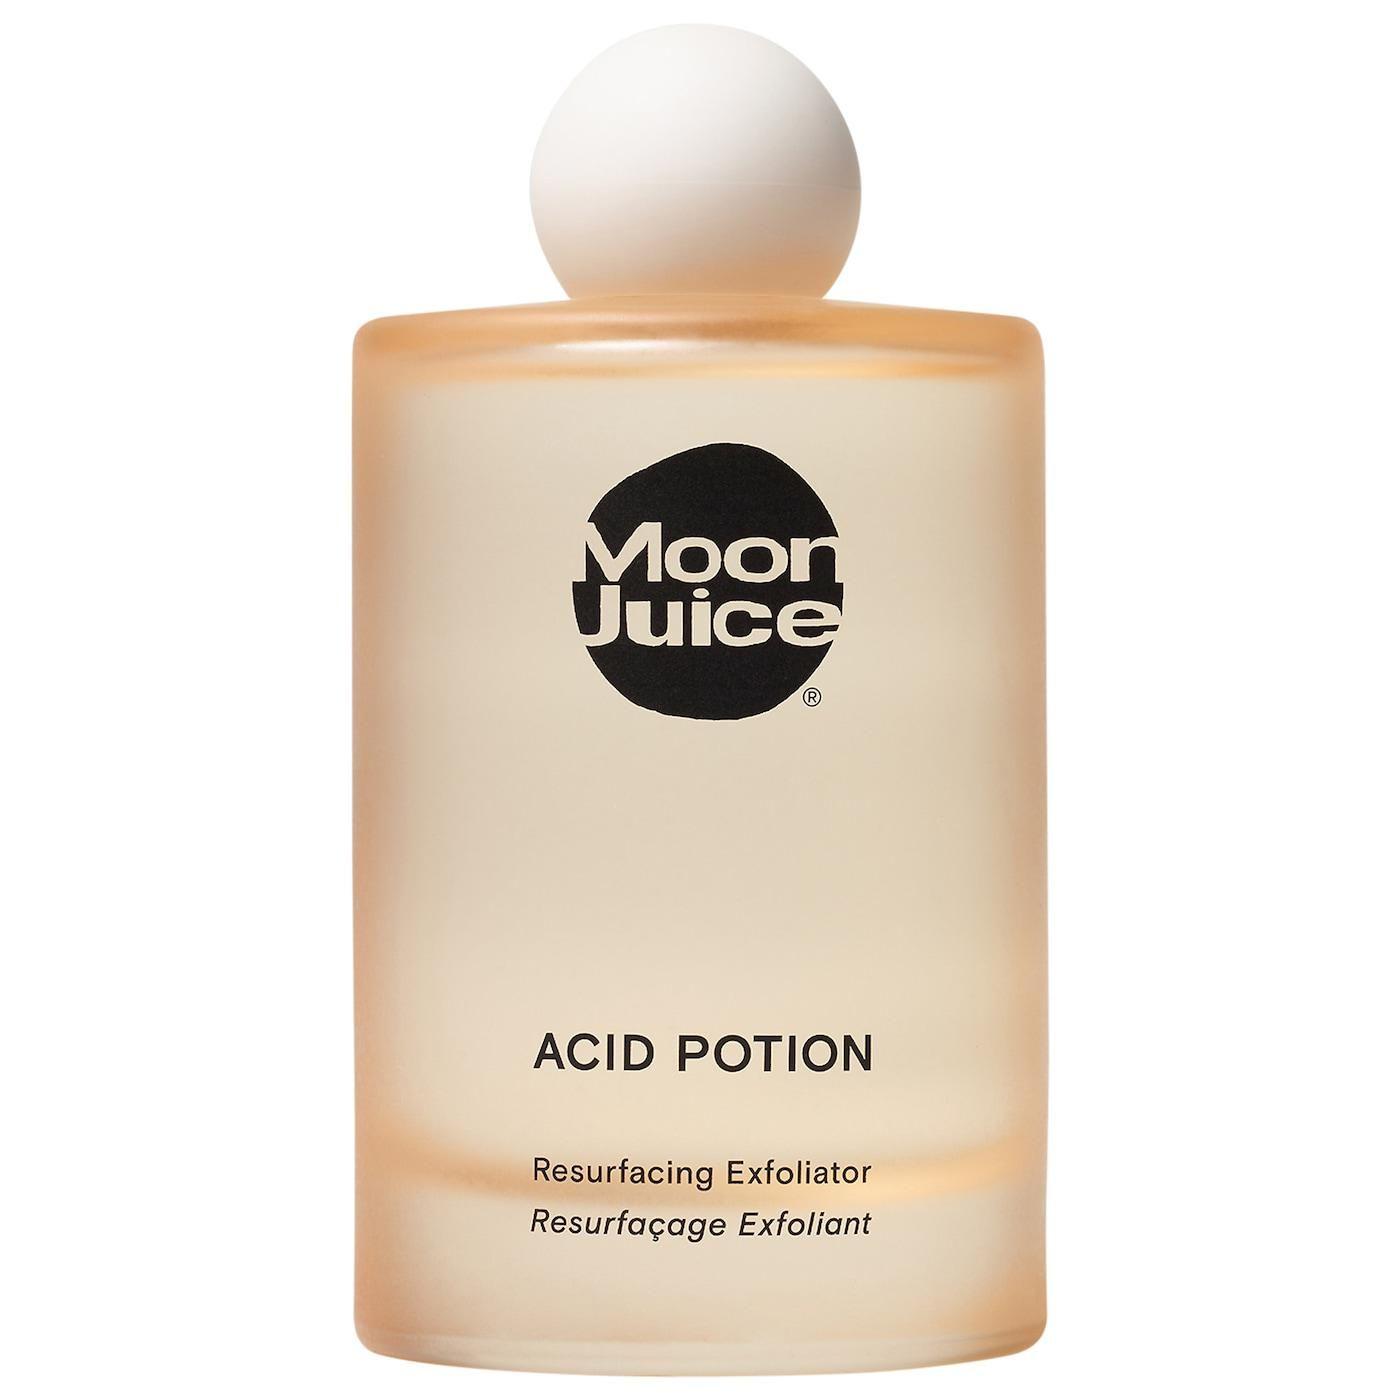 moon juice acid potion aha and bha resurfacing exfoliator